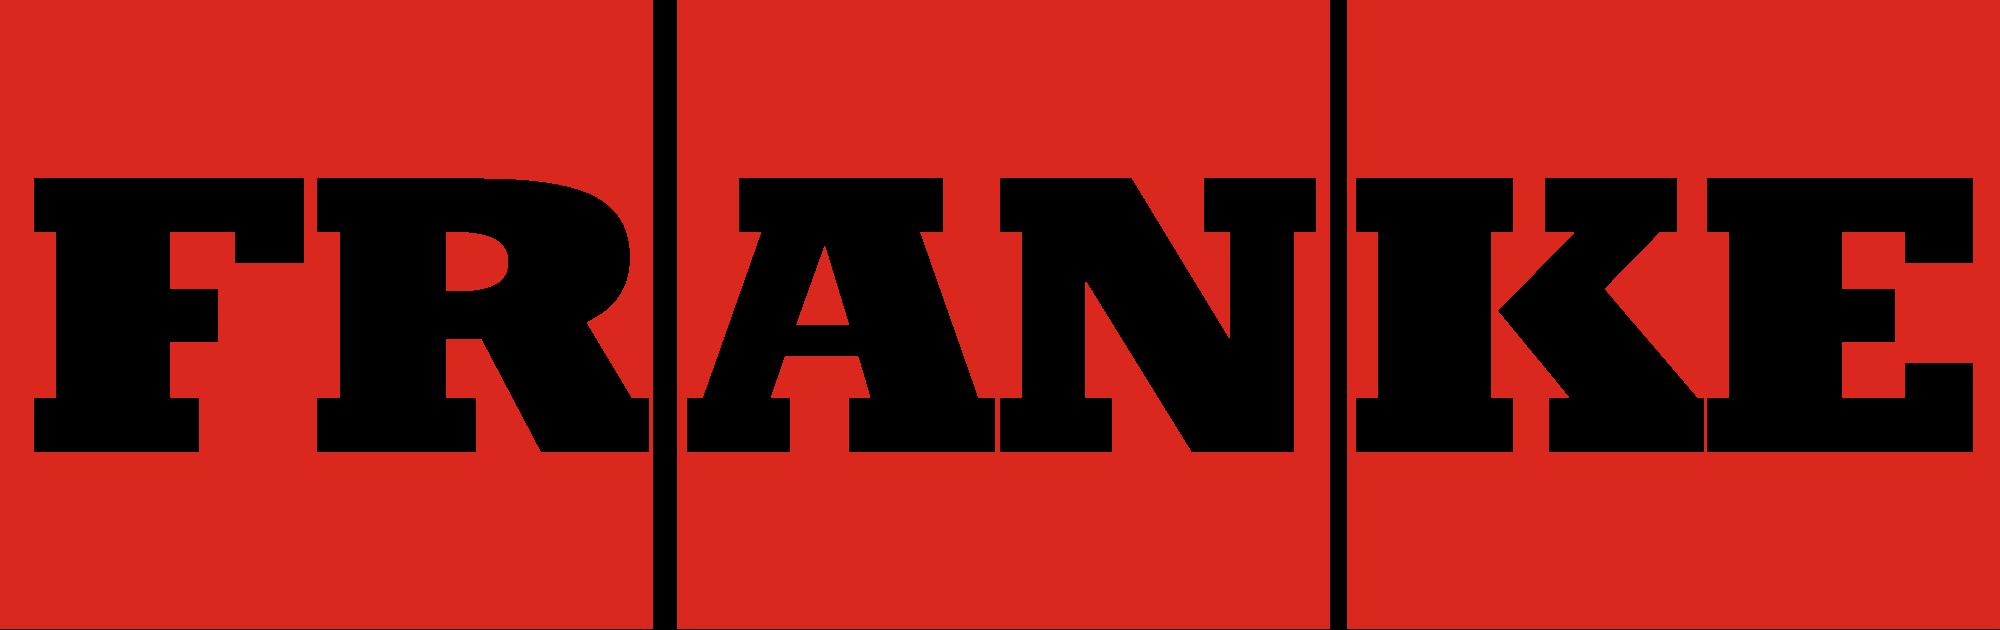 logo firmy franke